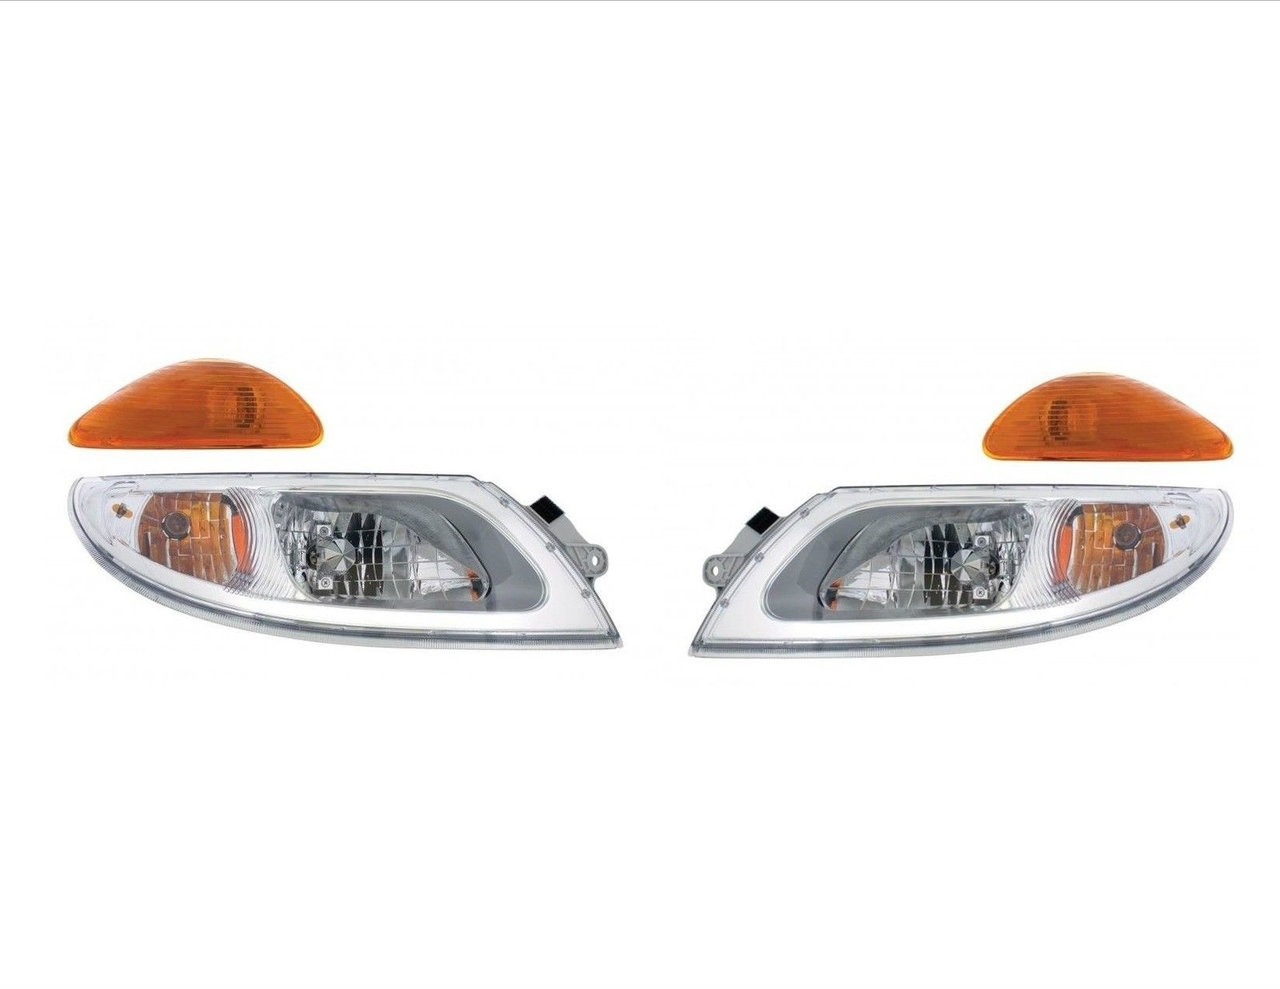 Headlight Set - International Durastar Trucks (2003+) Includes Turn Signals